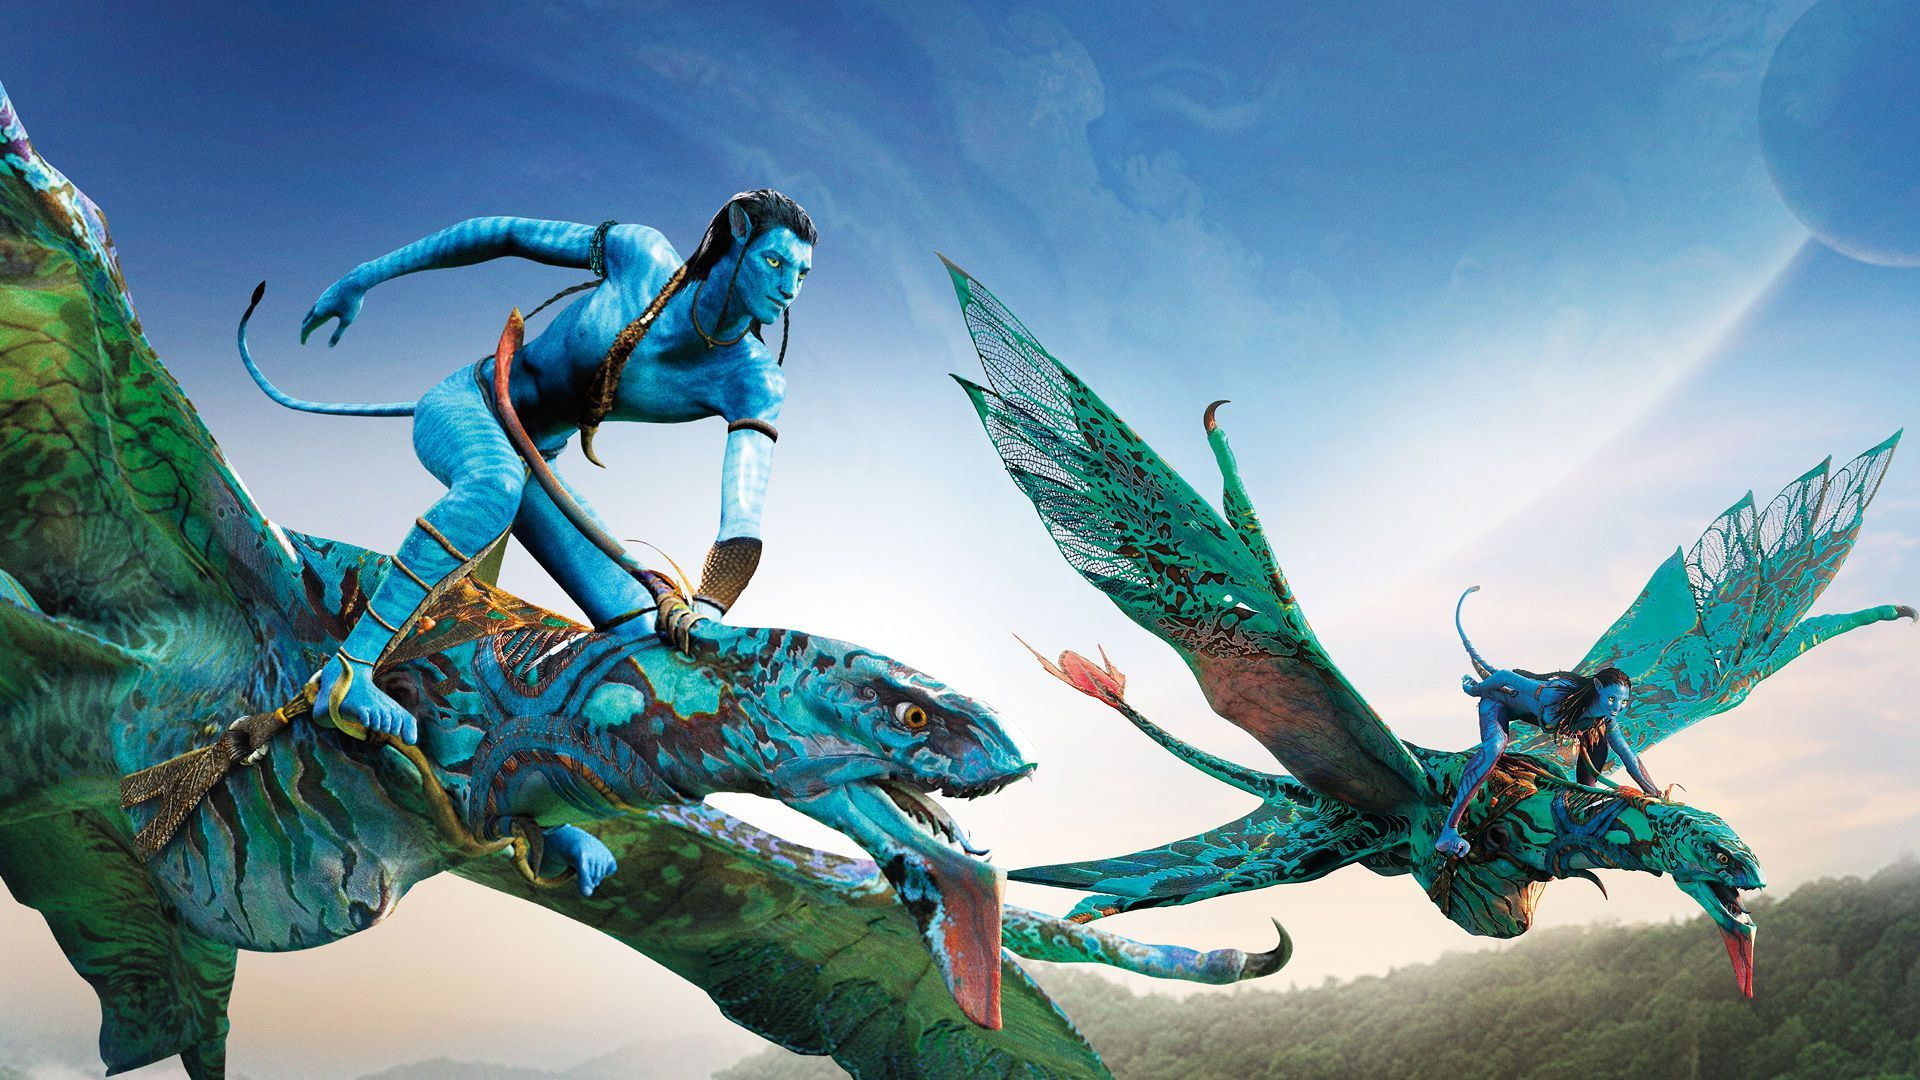 Must see Wallpaper Movie Avatar 2 - e73fa8d24b395390271169d7ab19b7c2  Image_646688.jpg